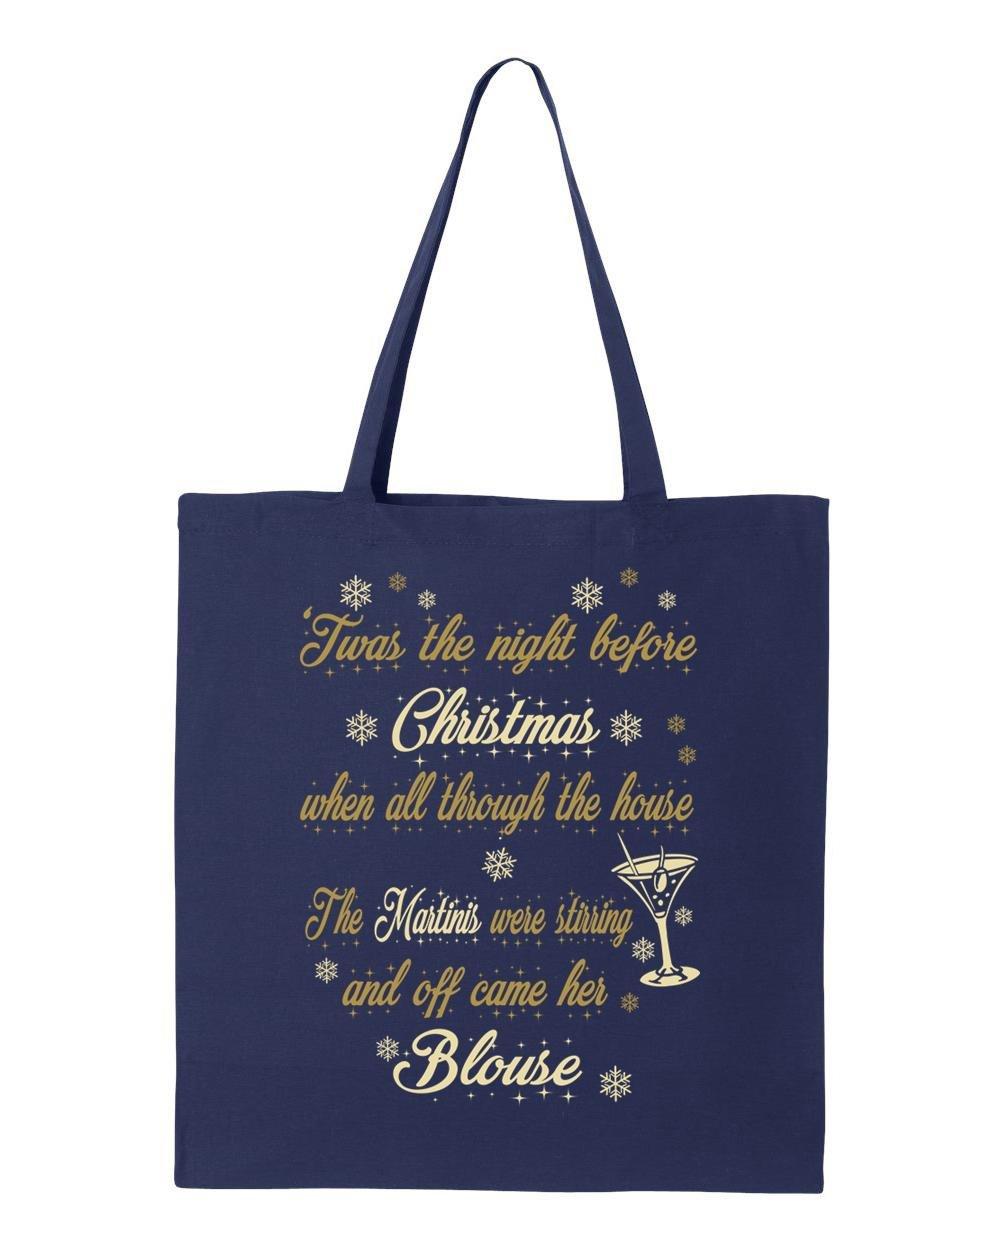 shop4ever Night BeforeクリスマスMartiniトートバッグ醜いクリスマス再利用可能なショッピングバッグ6オンスコットンキャンバス 6 oz ブルー XIT_1215_NghtMartini_TB_8502_Navy_3 B072B8QM75  ネイビー